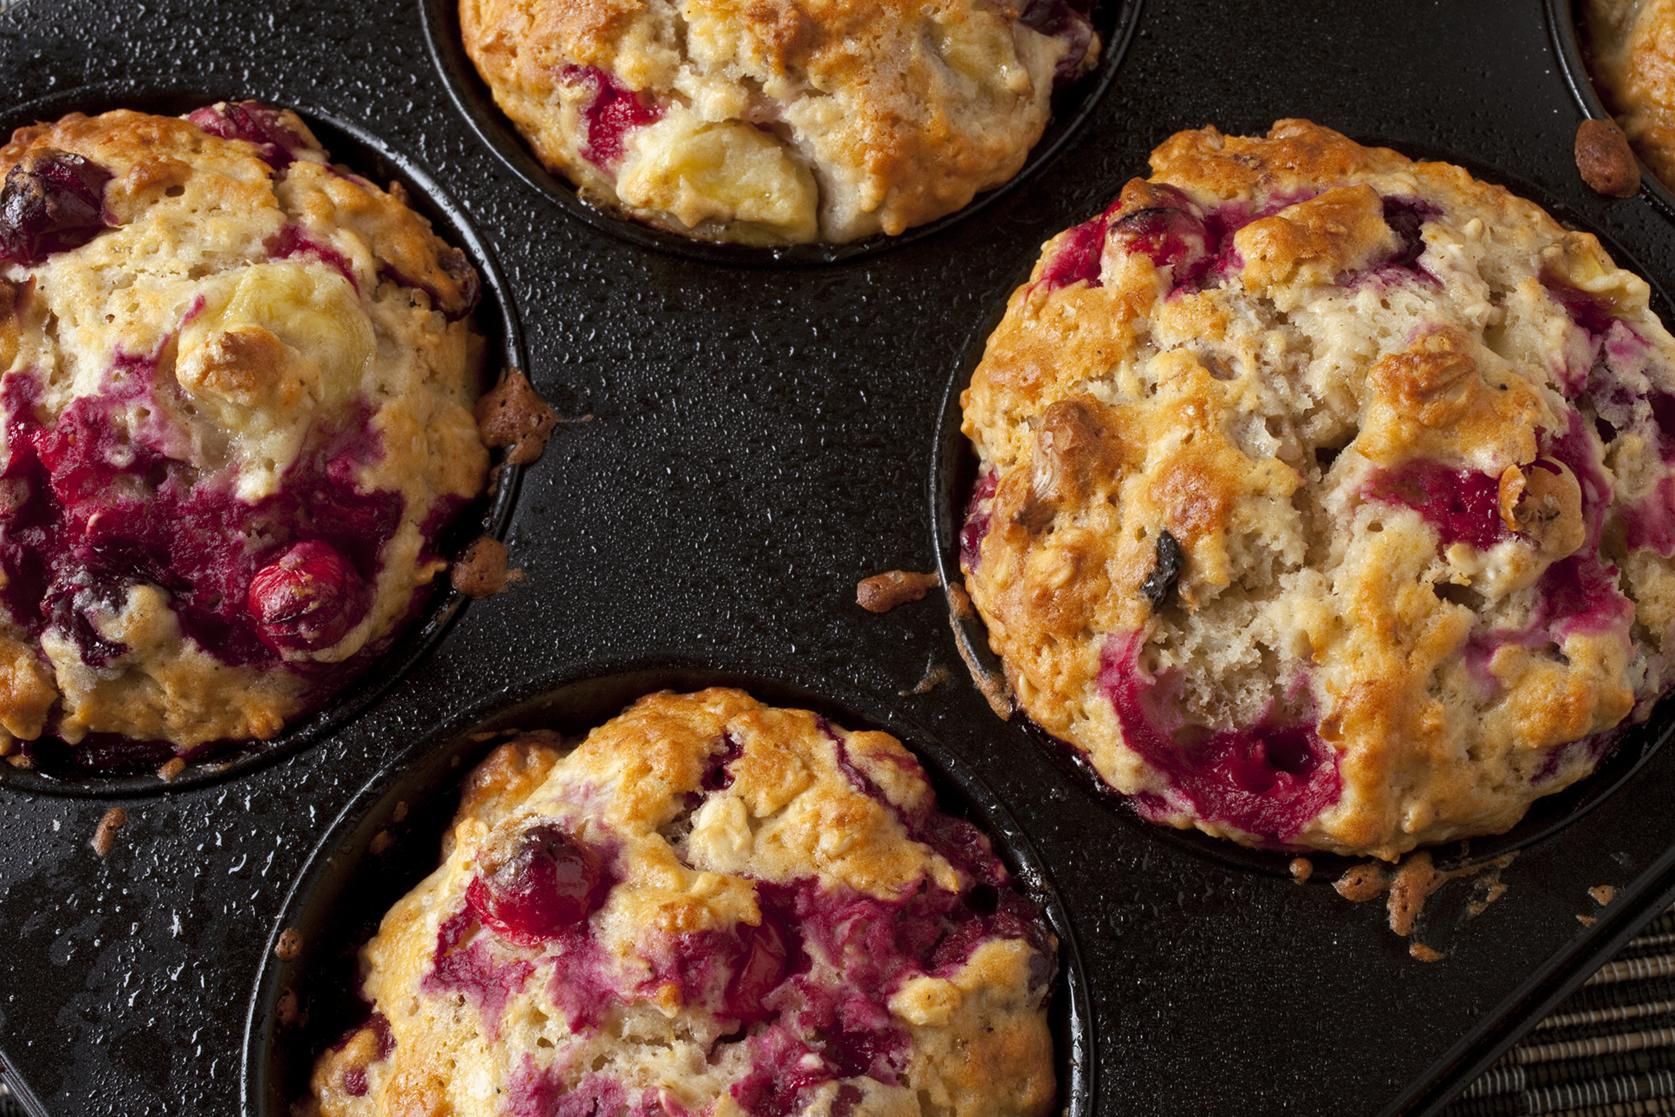 Gluten-free Mixed Berry Walnut Muffins